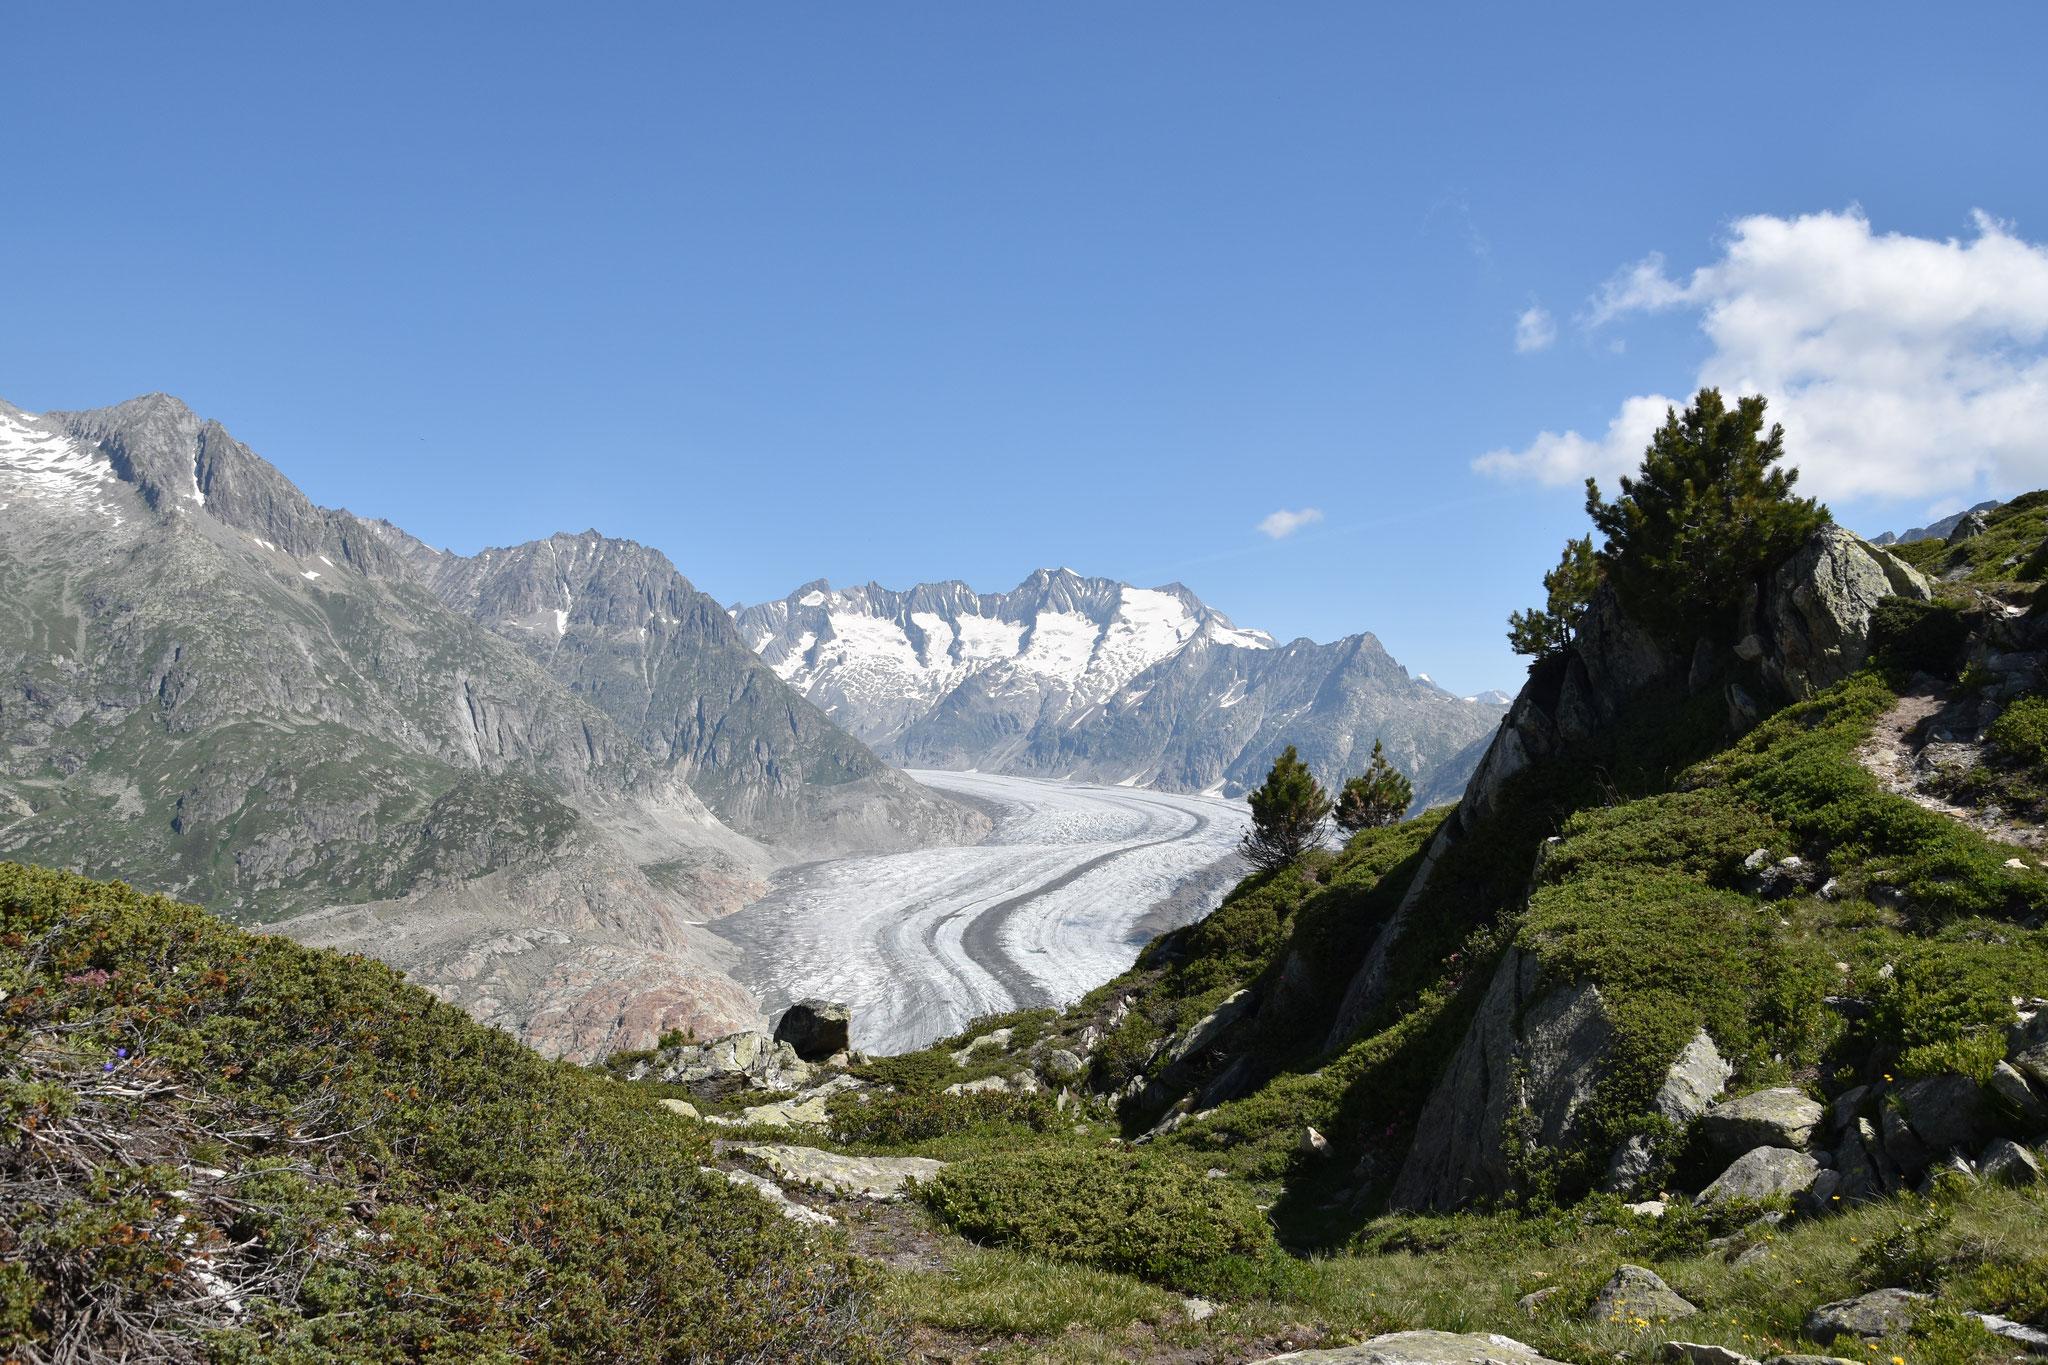 Der Grosse Aletschgletscher